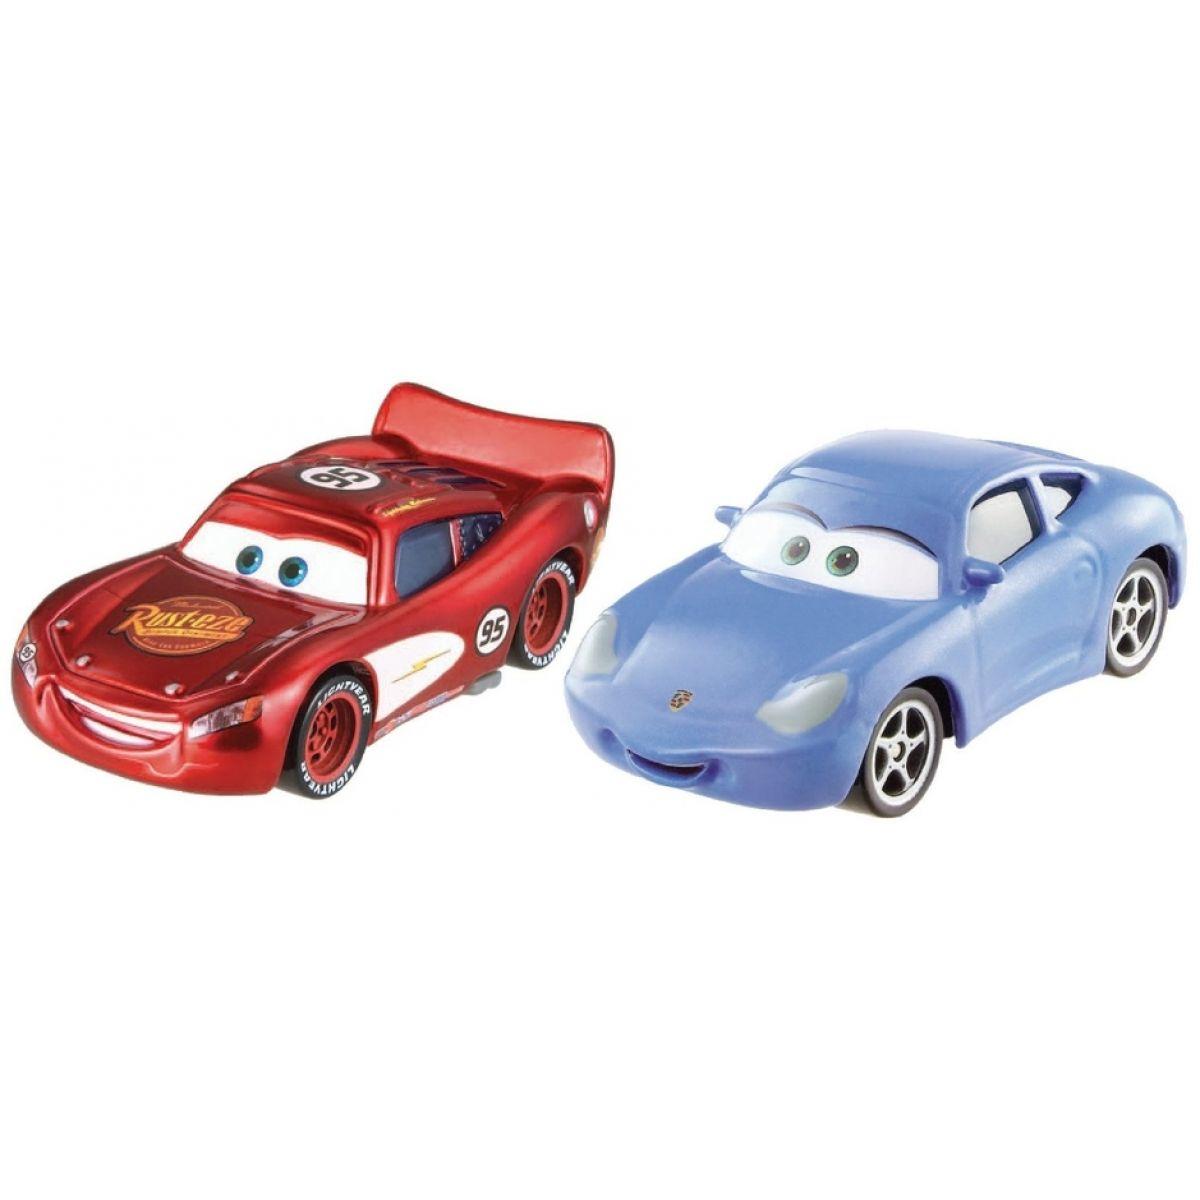 Mattel Cars 2 Autíčka 2ks - Sally a McQueen